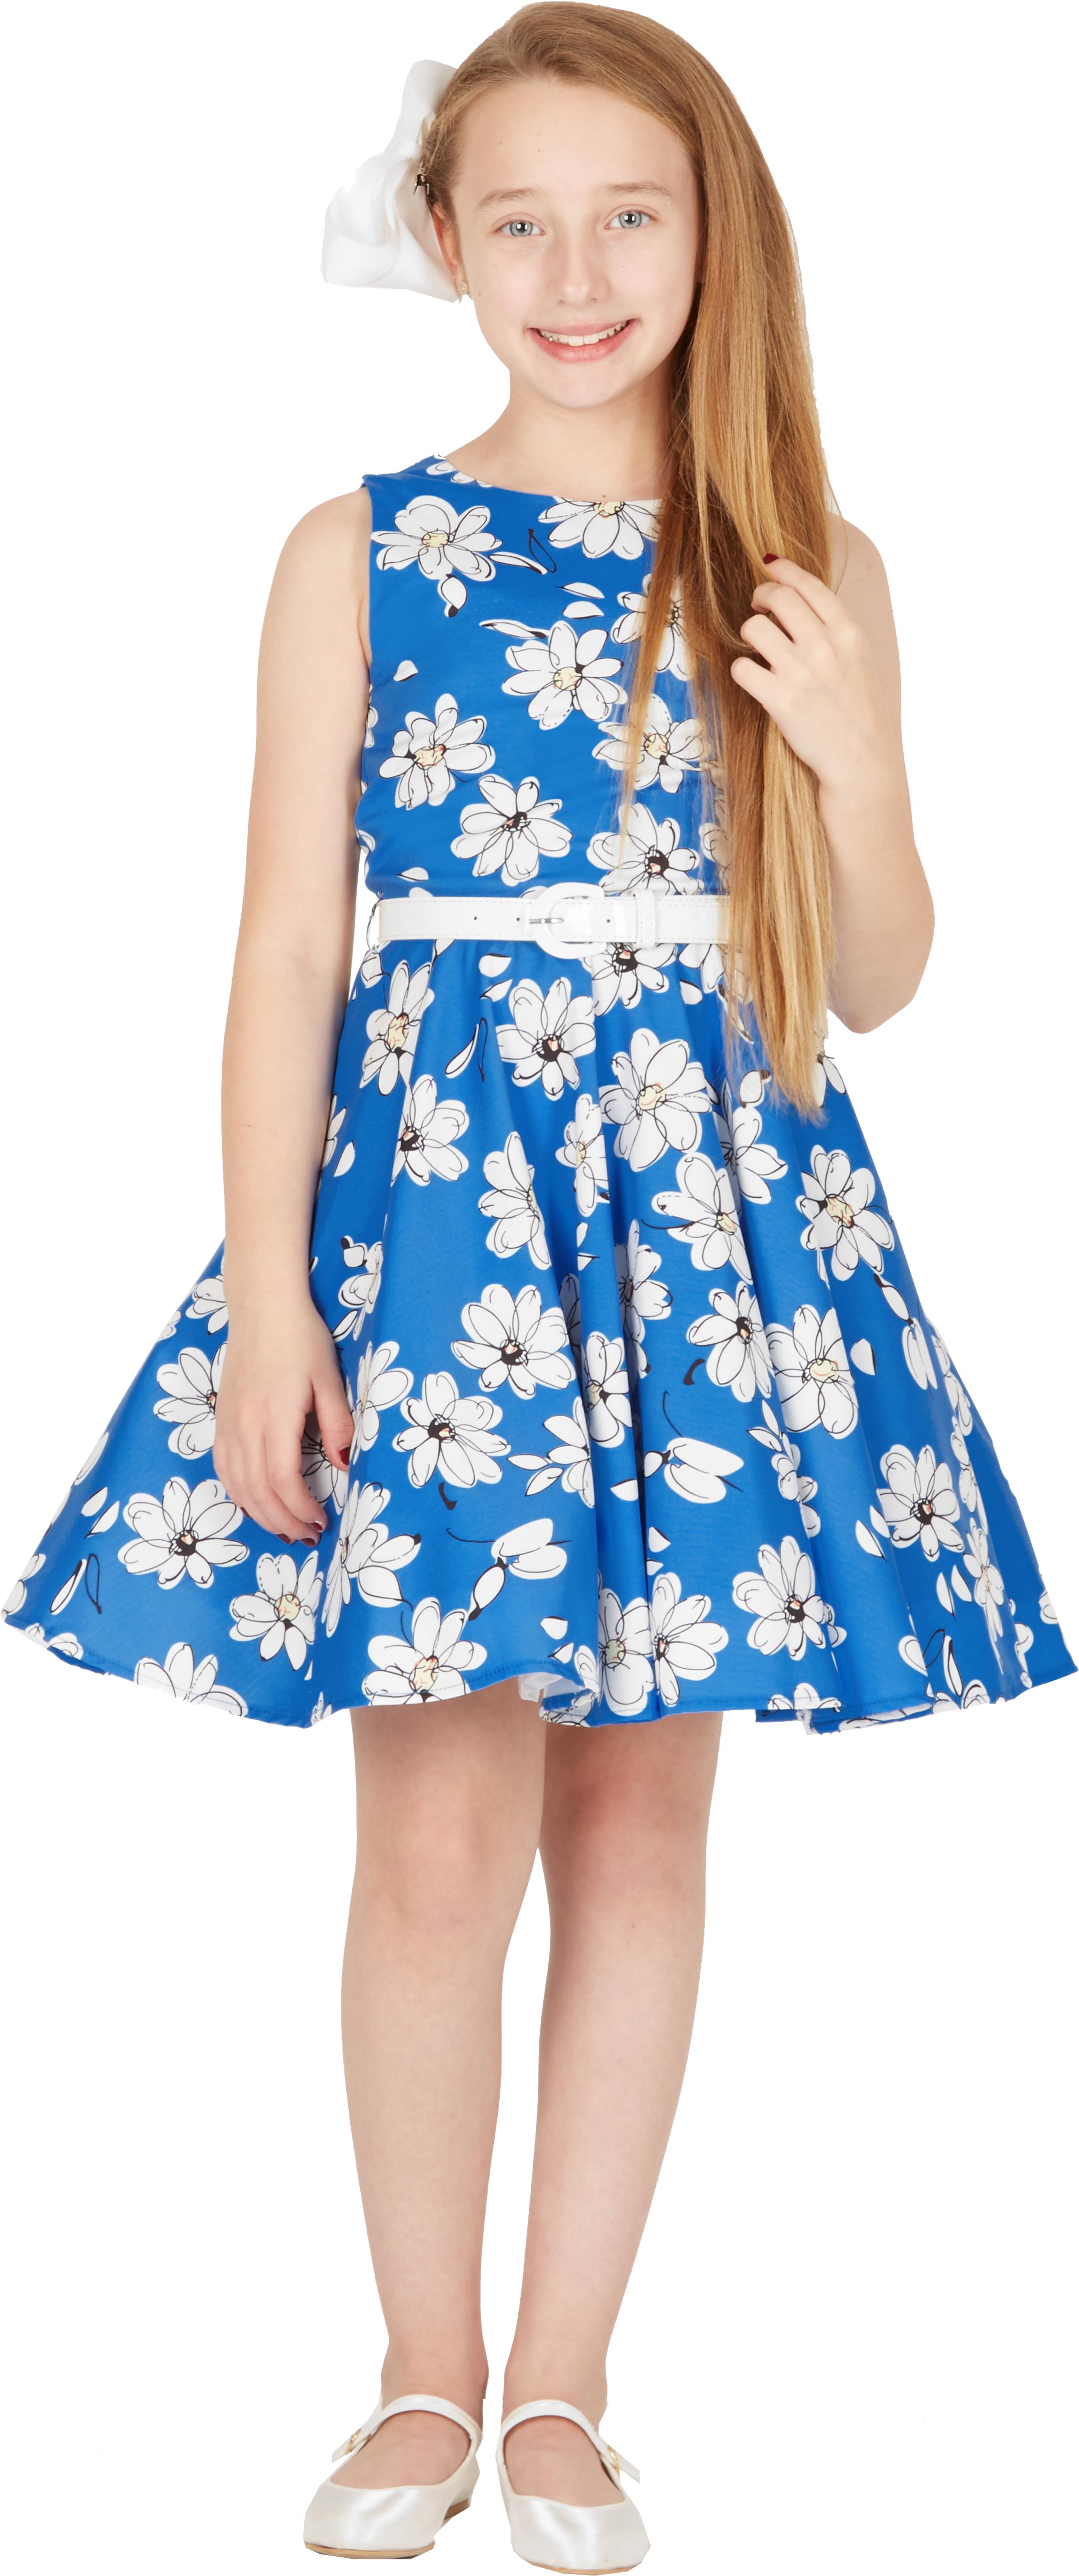 e8d693bf6ab9c Kids  Audrey  Vintage Daisy 50 s Party Girls Prom Dress